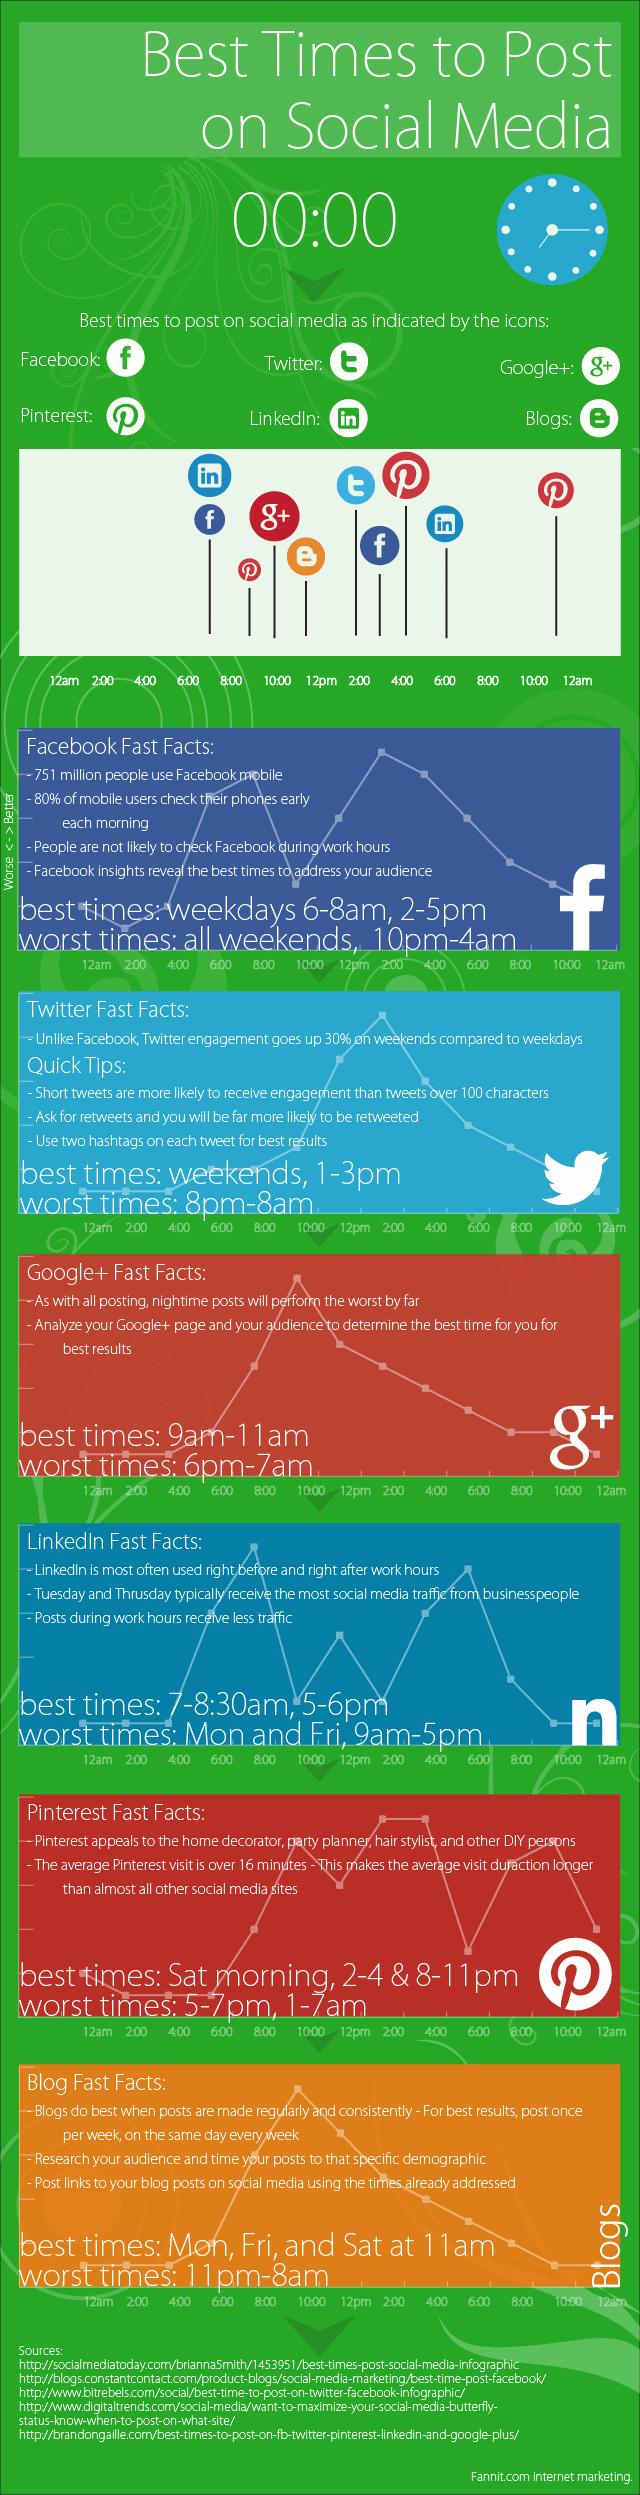 Social Media - Best Times Post